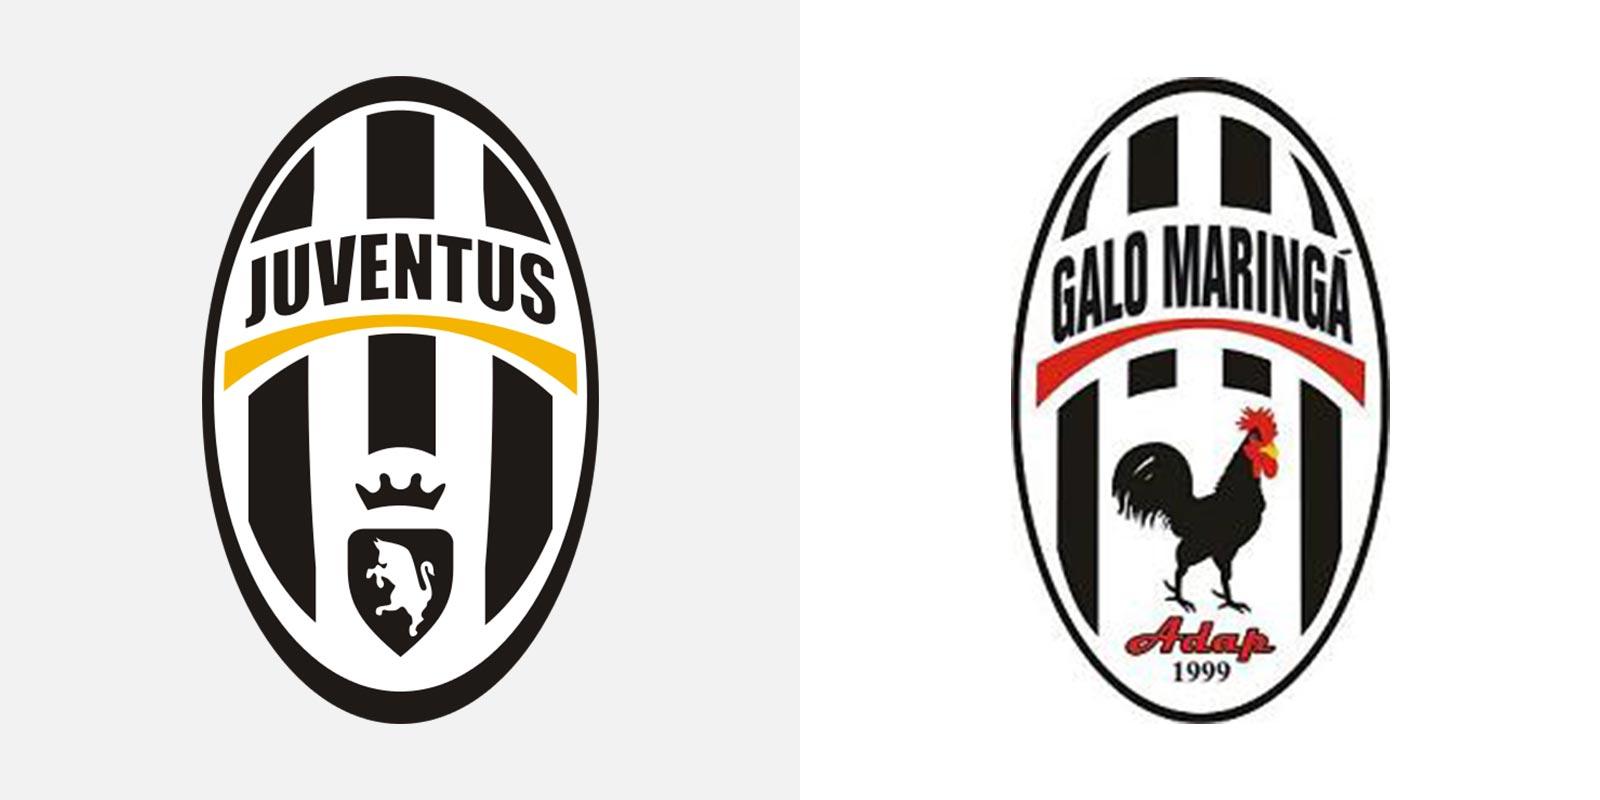 Juventus (old) - Galo Maringá